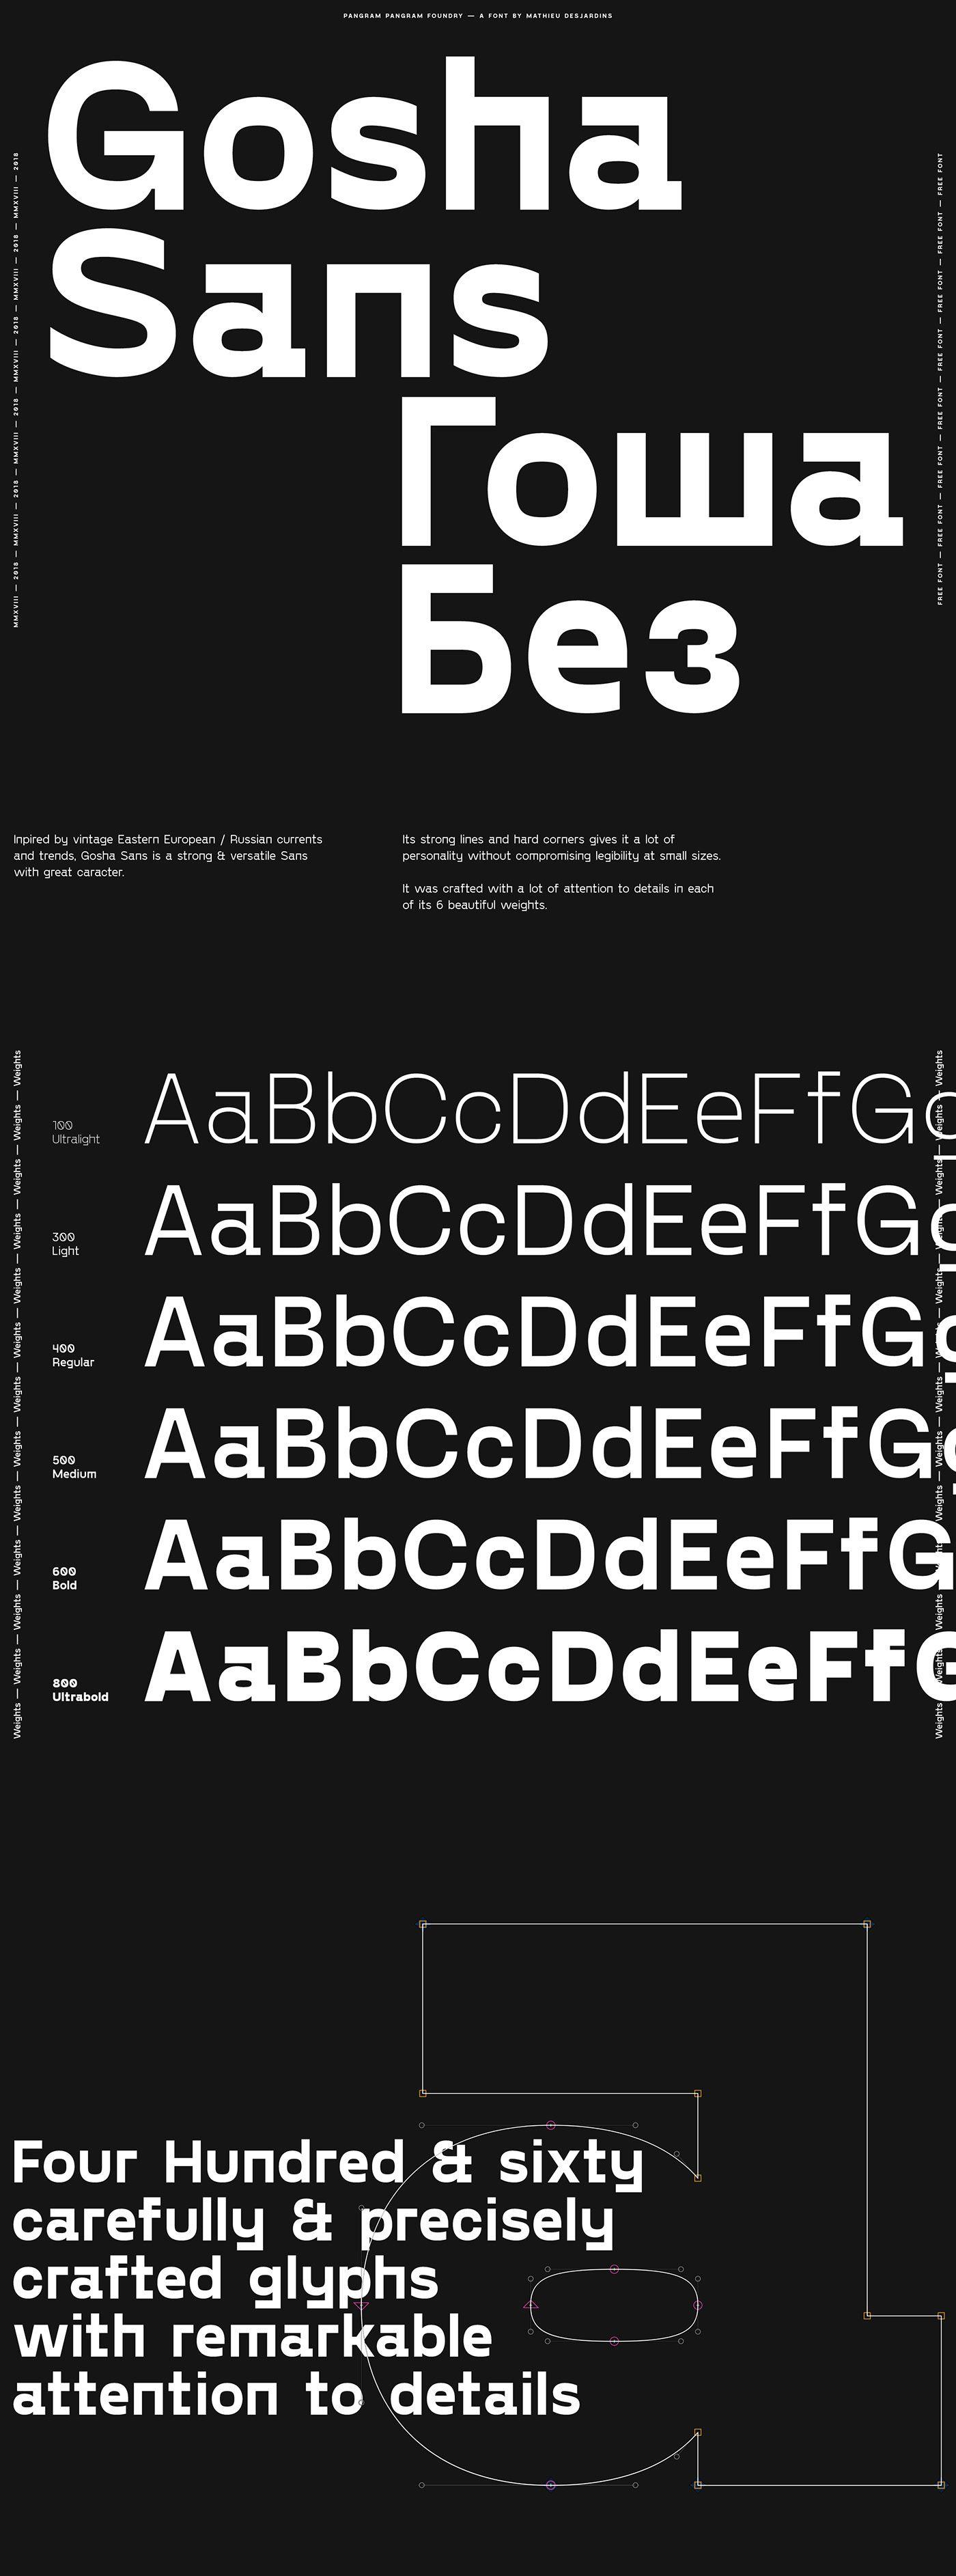 Gosha Sans / Гоша Без — Free Font on Behance Free font